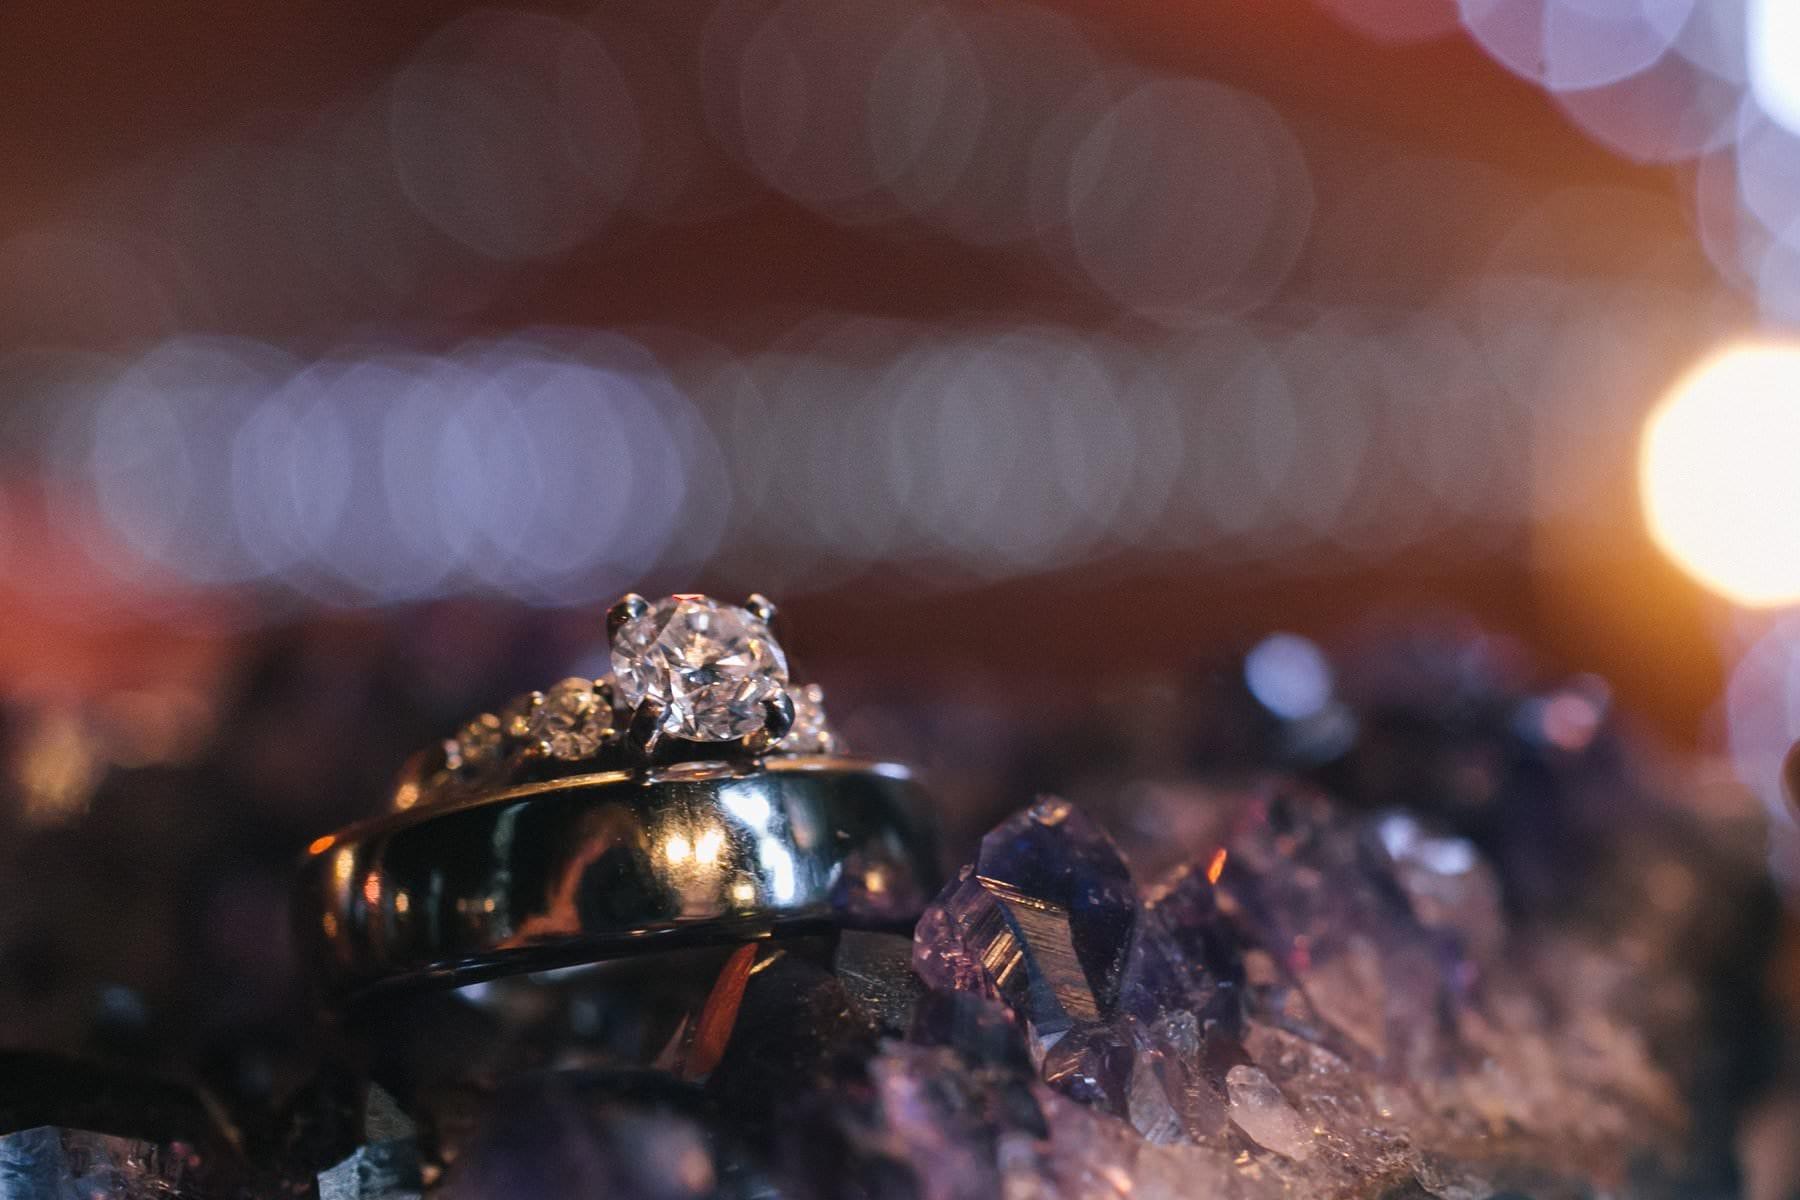 Phoenix wedding rings on top of amethyst boho wedding